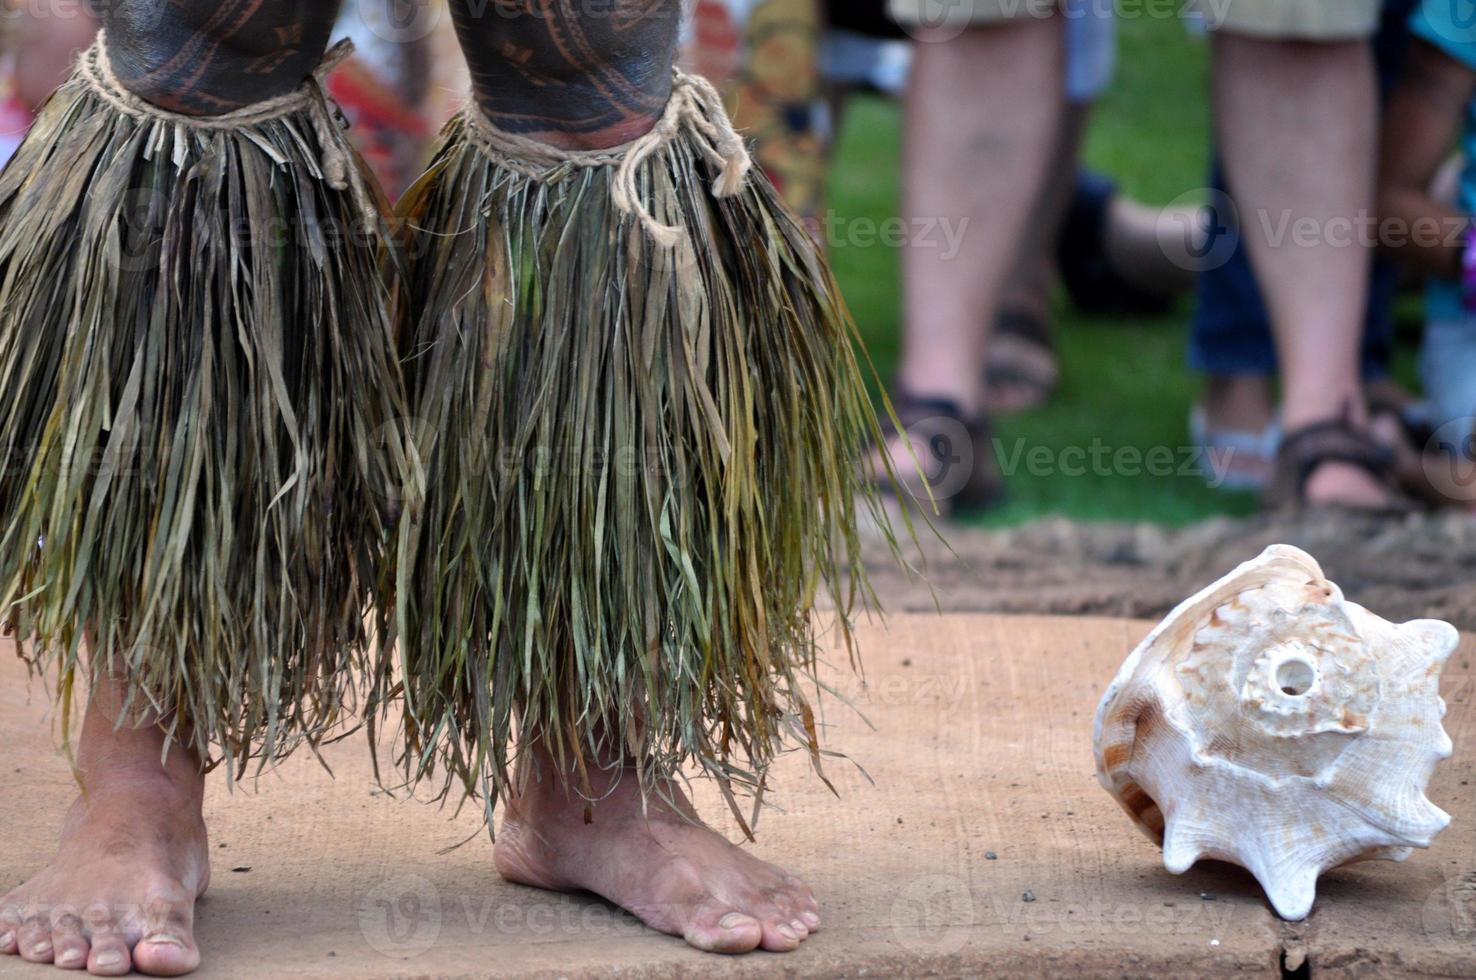 leggings cerimoniali hawaiani a luau foto